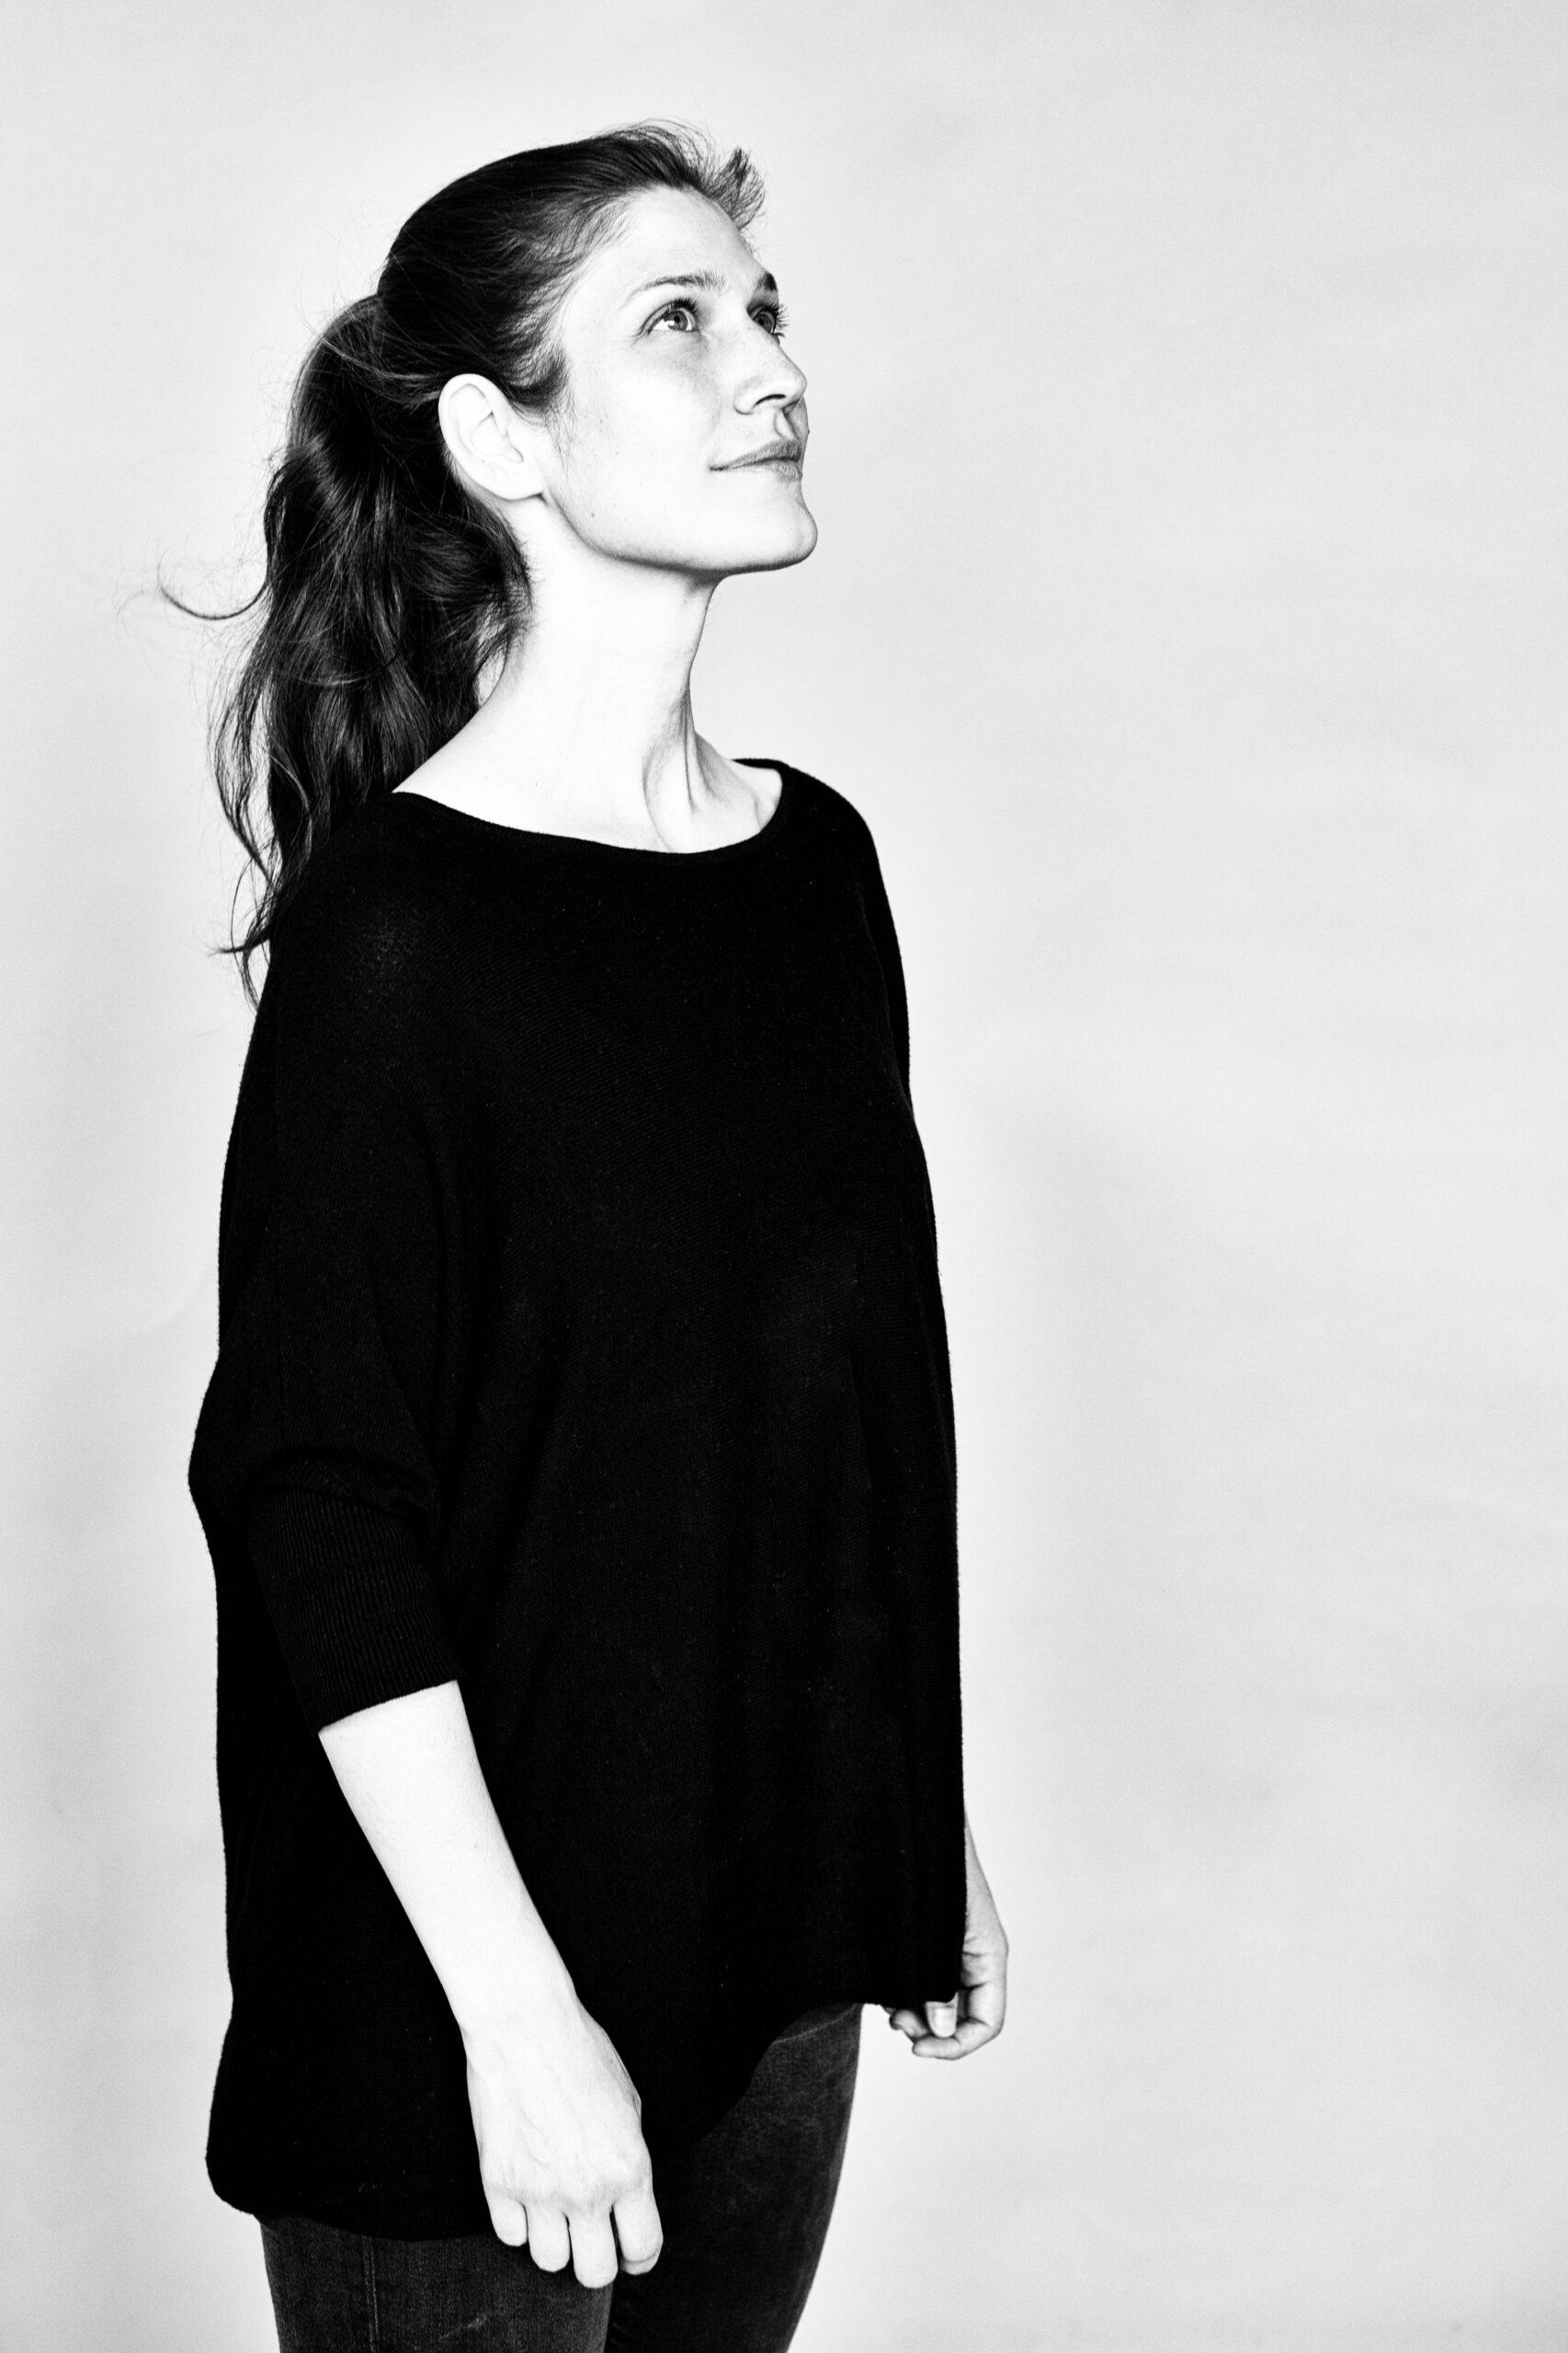 03_Alin by Sandra Ludewig